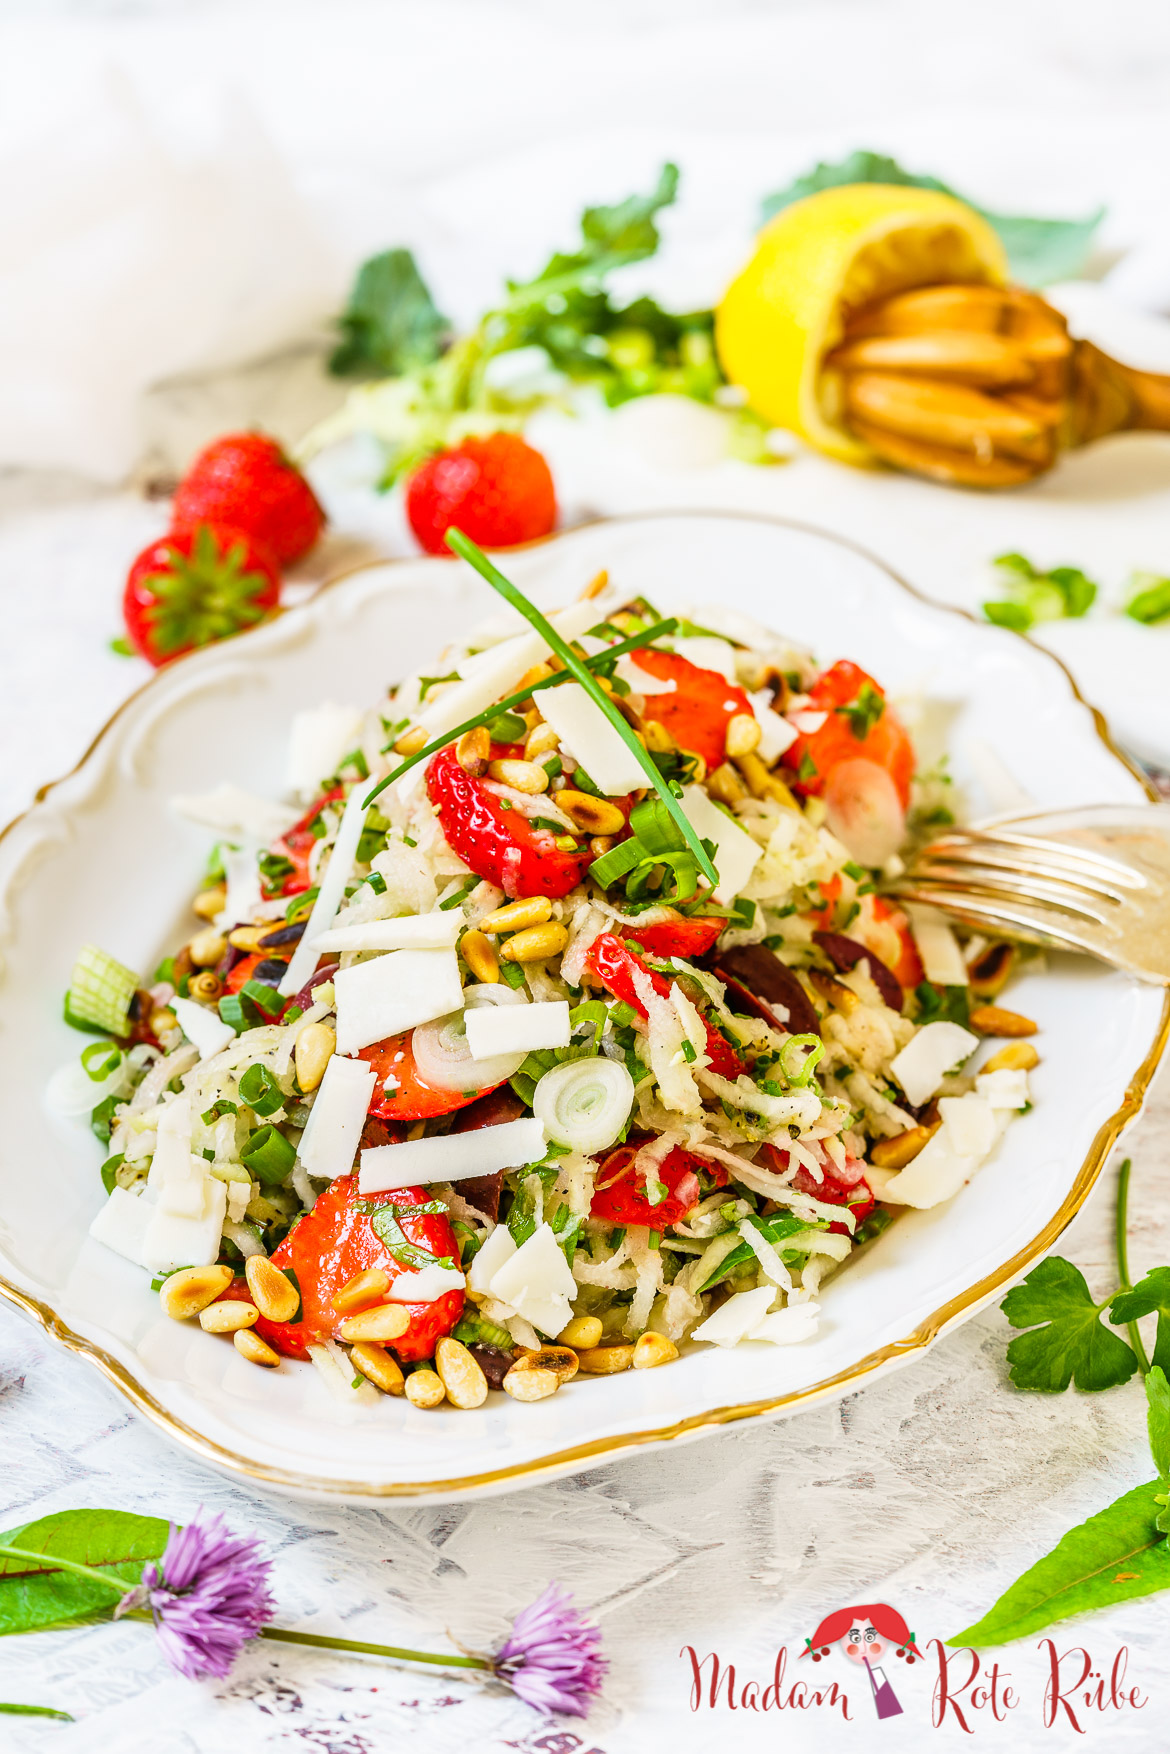 Madam Rote Rübe - Kohlrabi-Kräuter-Salat mit Erdbeeren